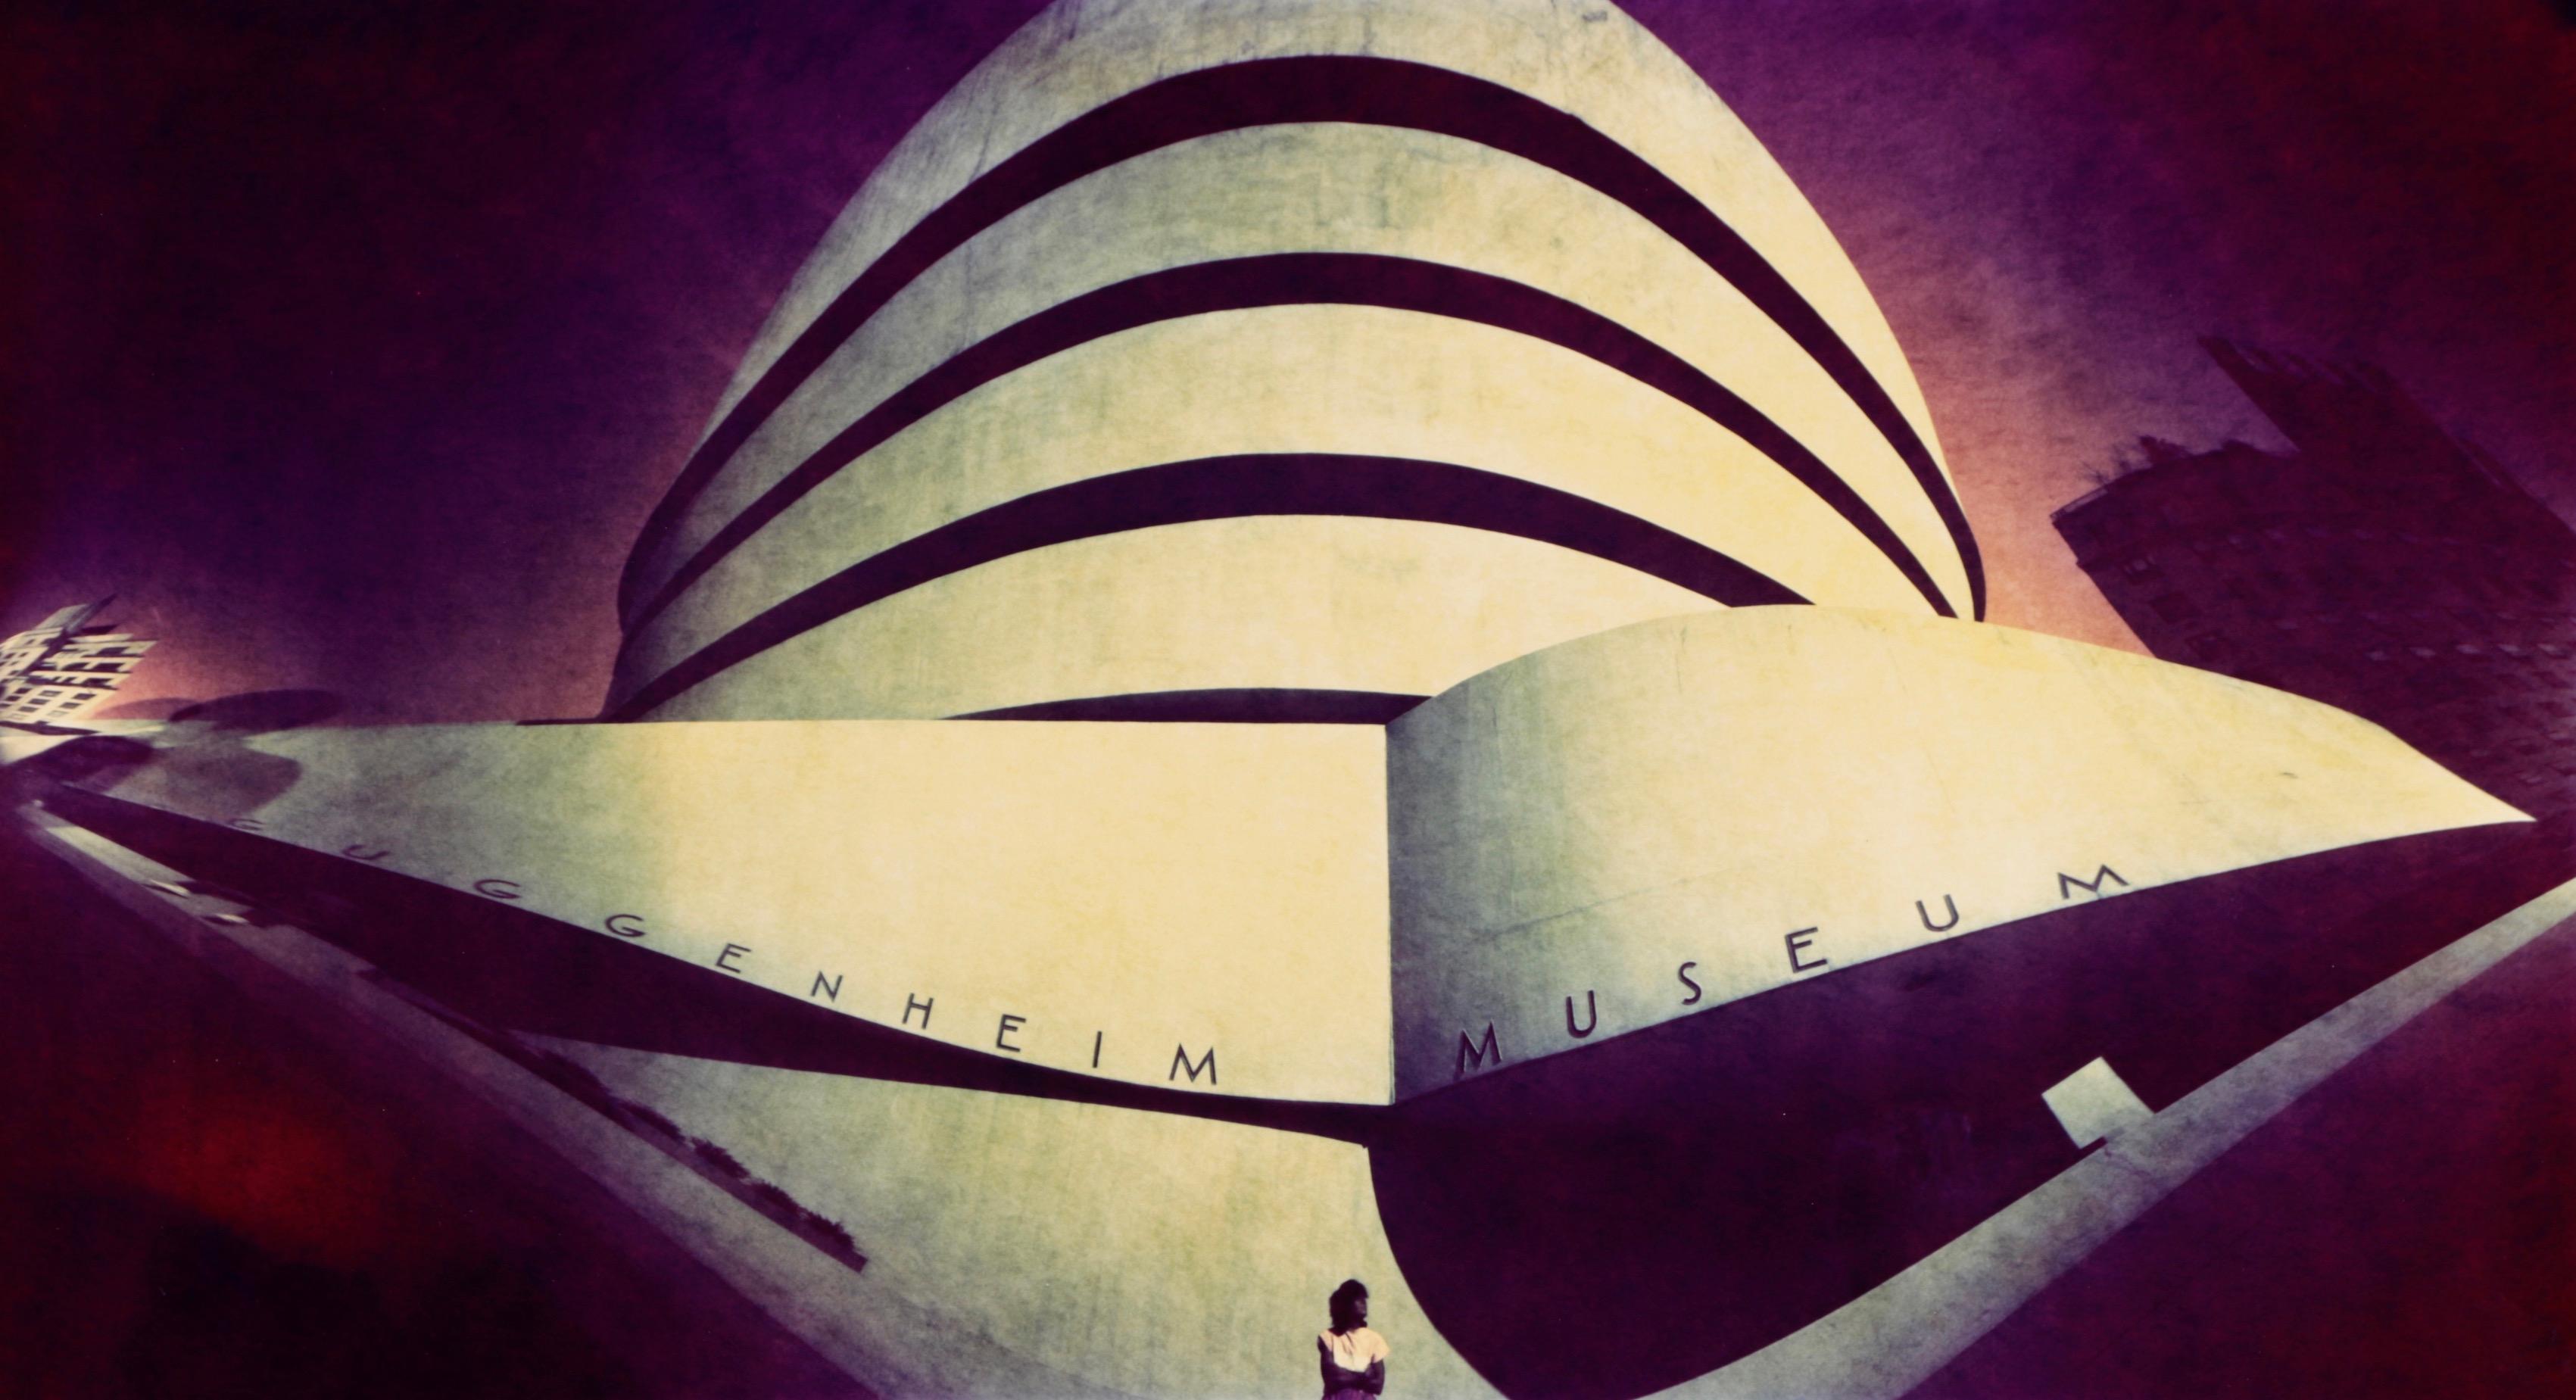 Guggenheim museum-N.Y. (1988) - Ilan Wolff